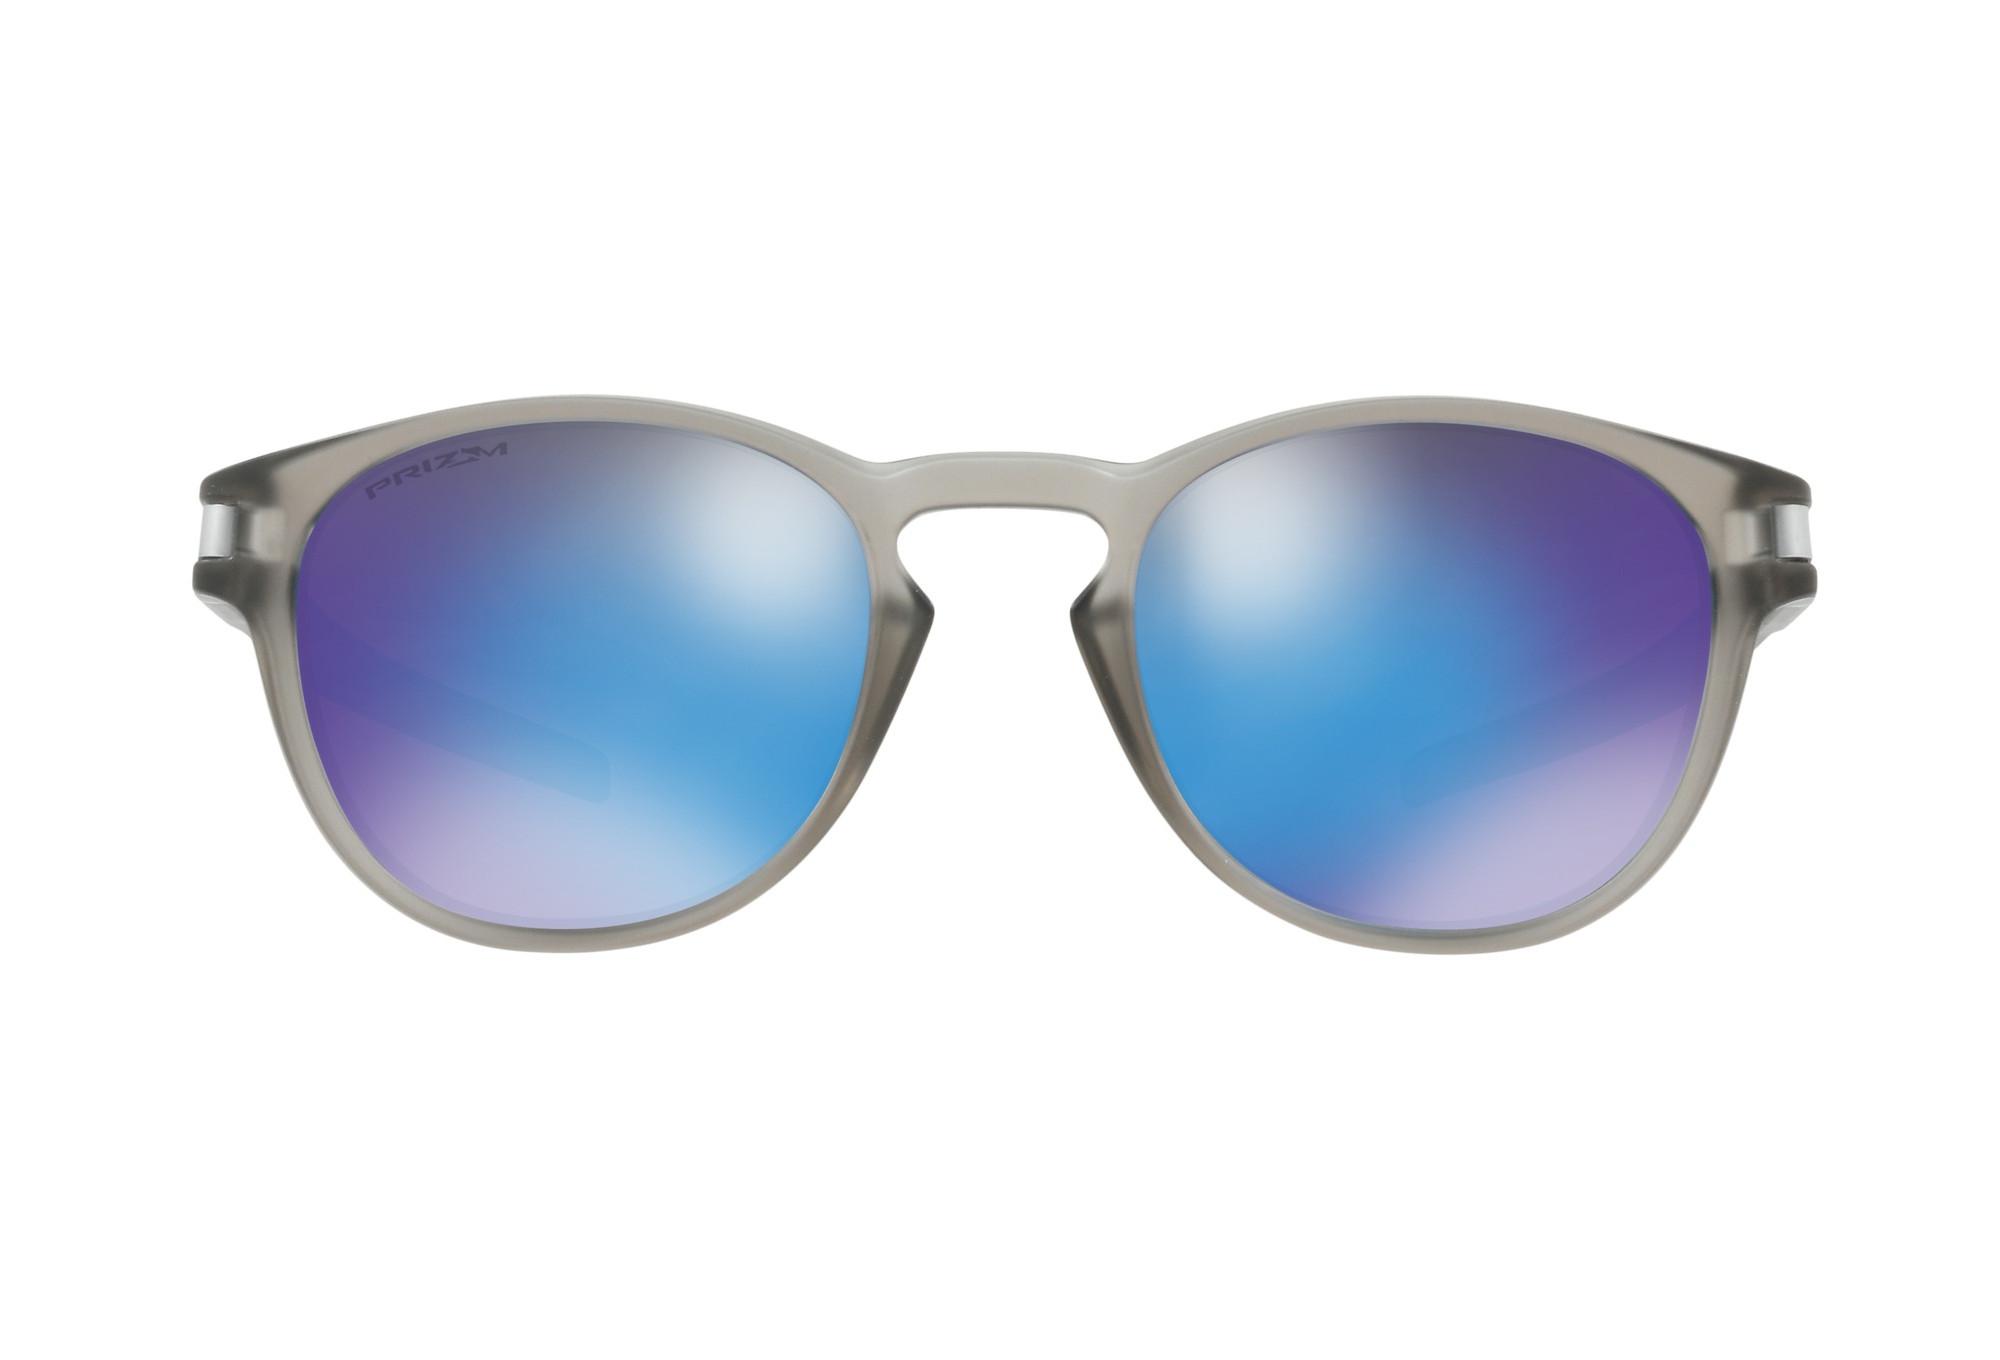 oakley latch sonnenbrille klar blau prizm polarisiert ref oo9265 3253. Black Bedroom Furniture Sets. Home Design Ideas